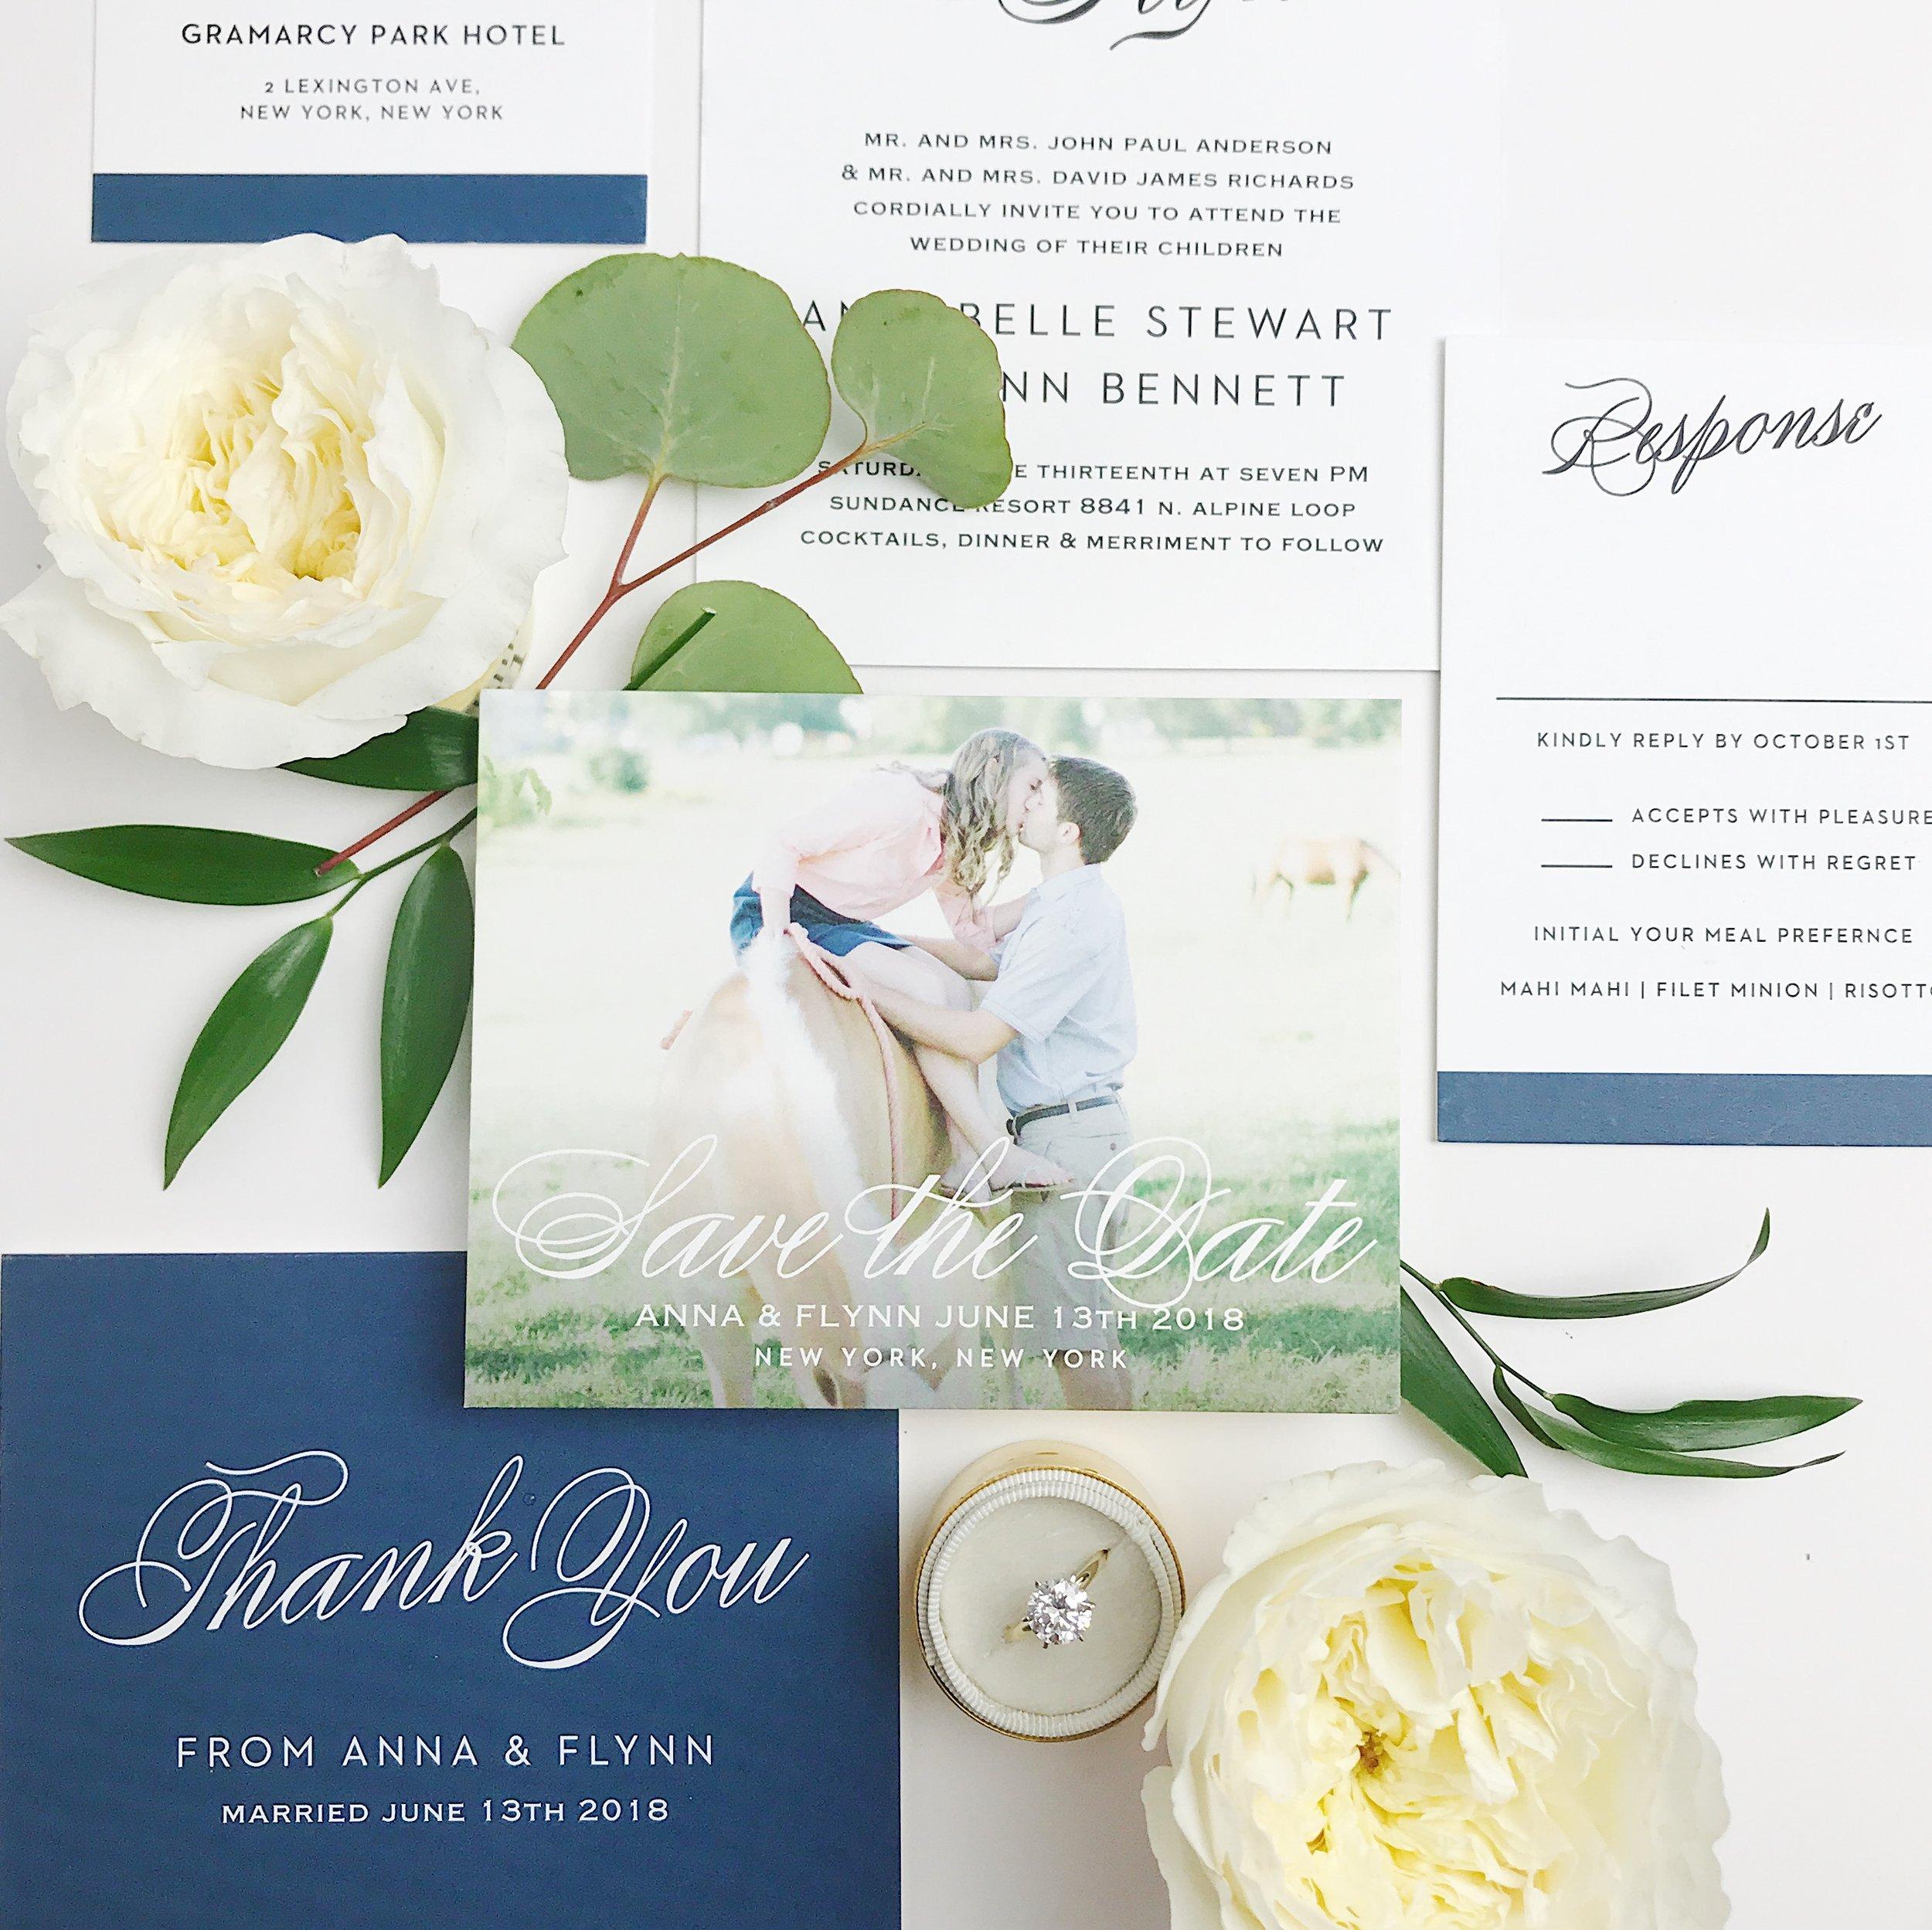 Basic_Invite_Wedding_Suites_53.jpg